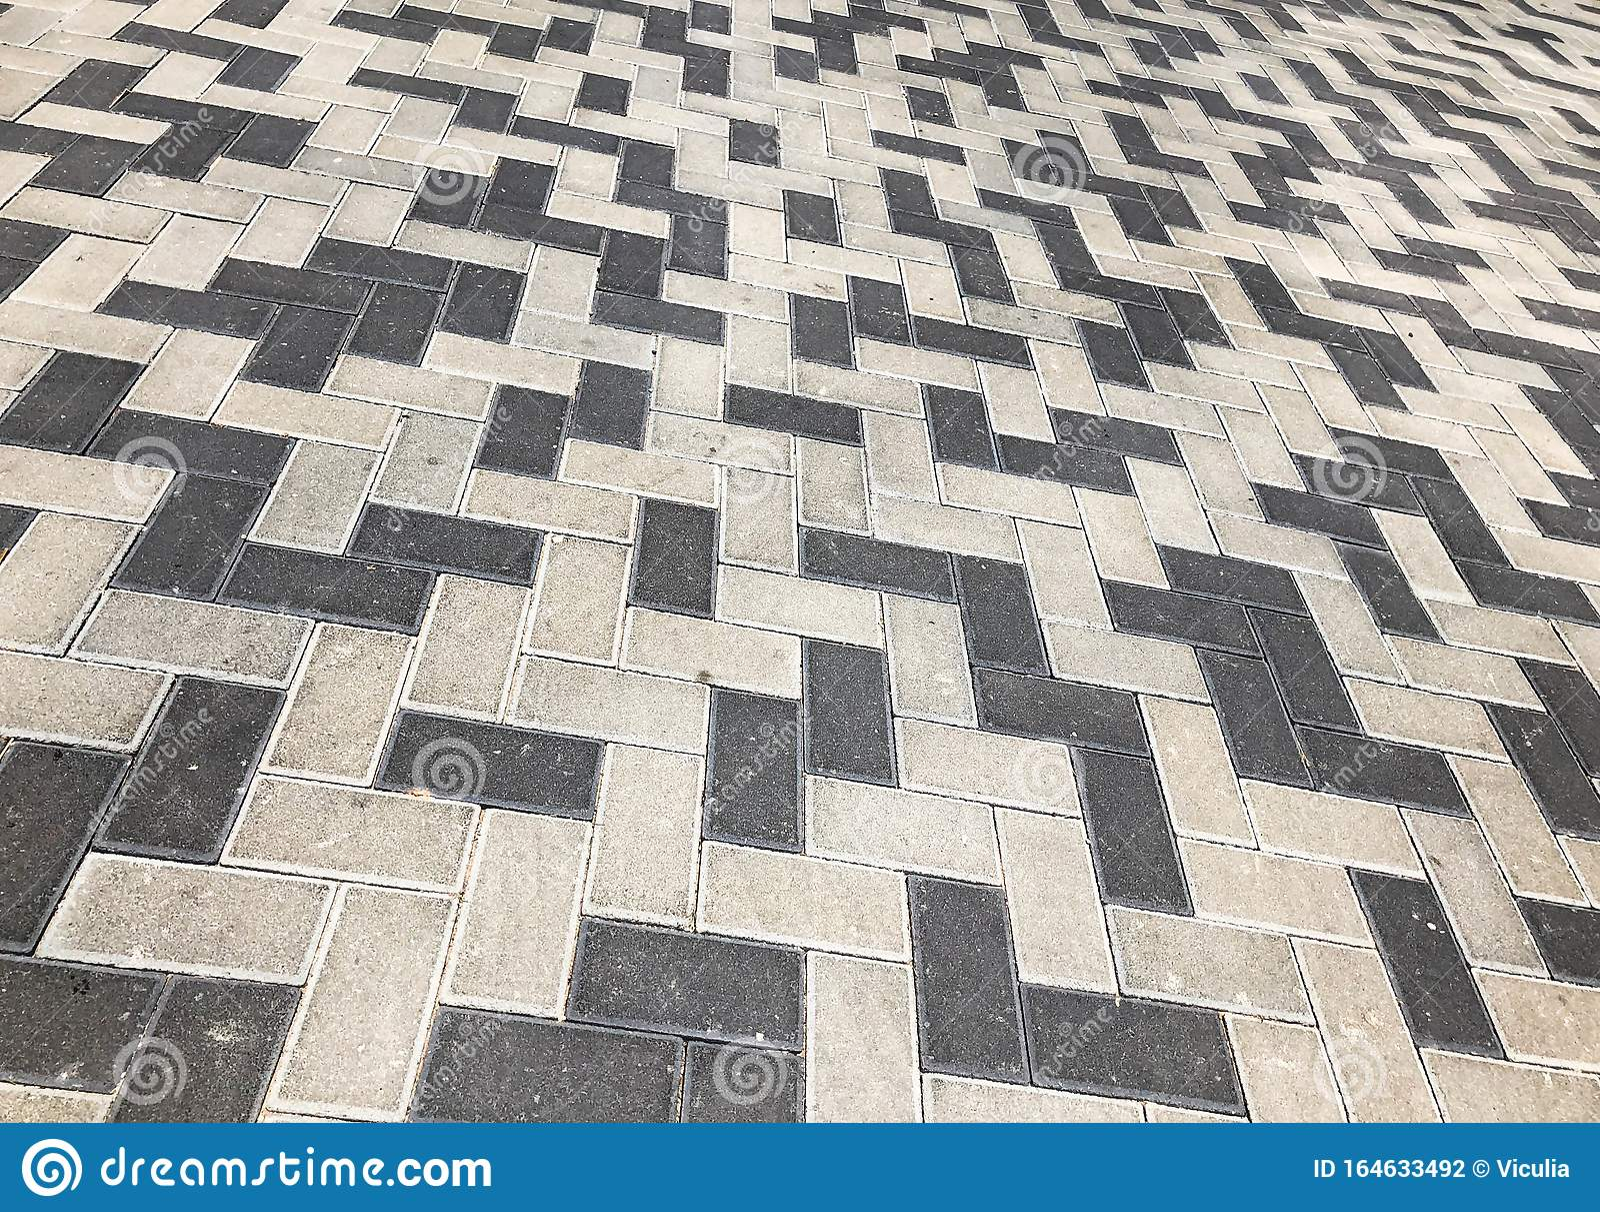 Gray Tiles Granite Floor Background Pavement Tiles Outdoor Urban Land Stock Photo Image Of Hexagon Concrete 164633492